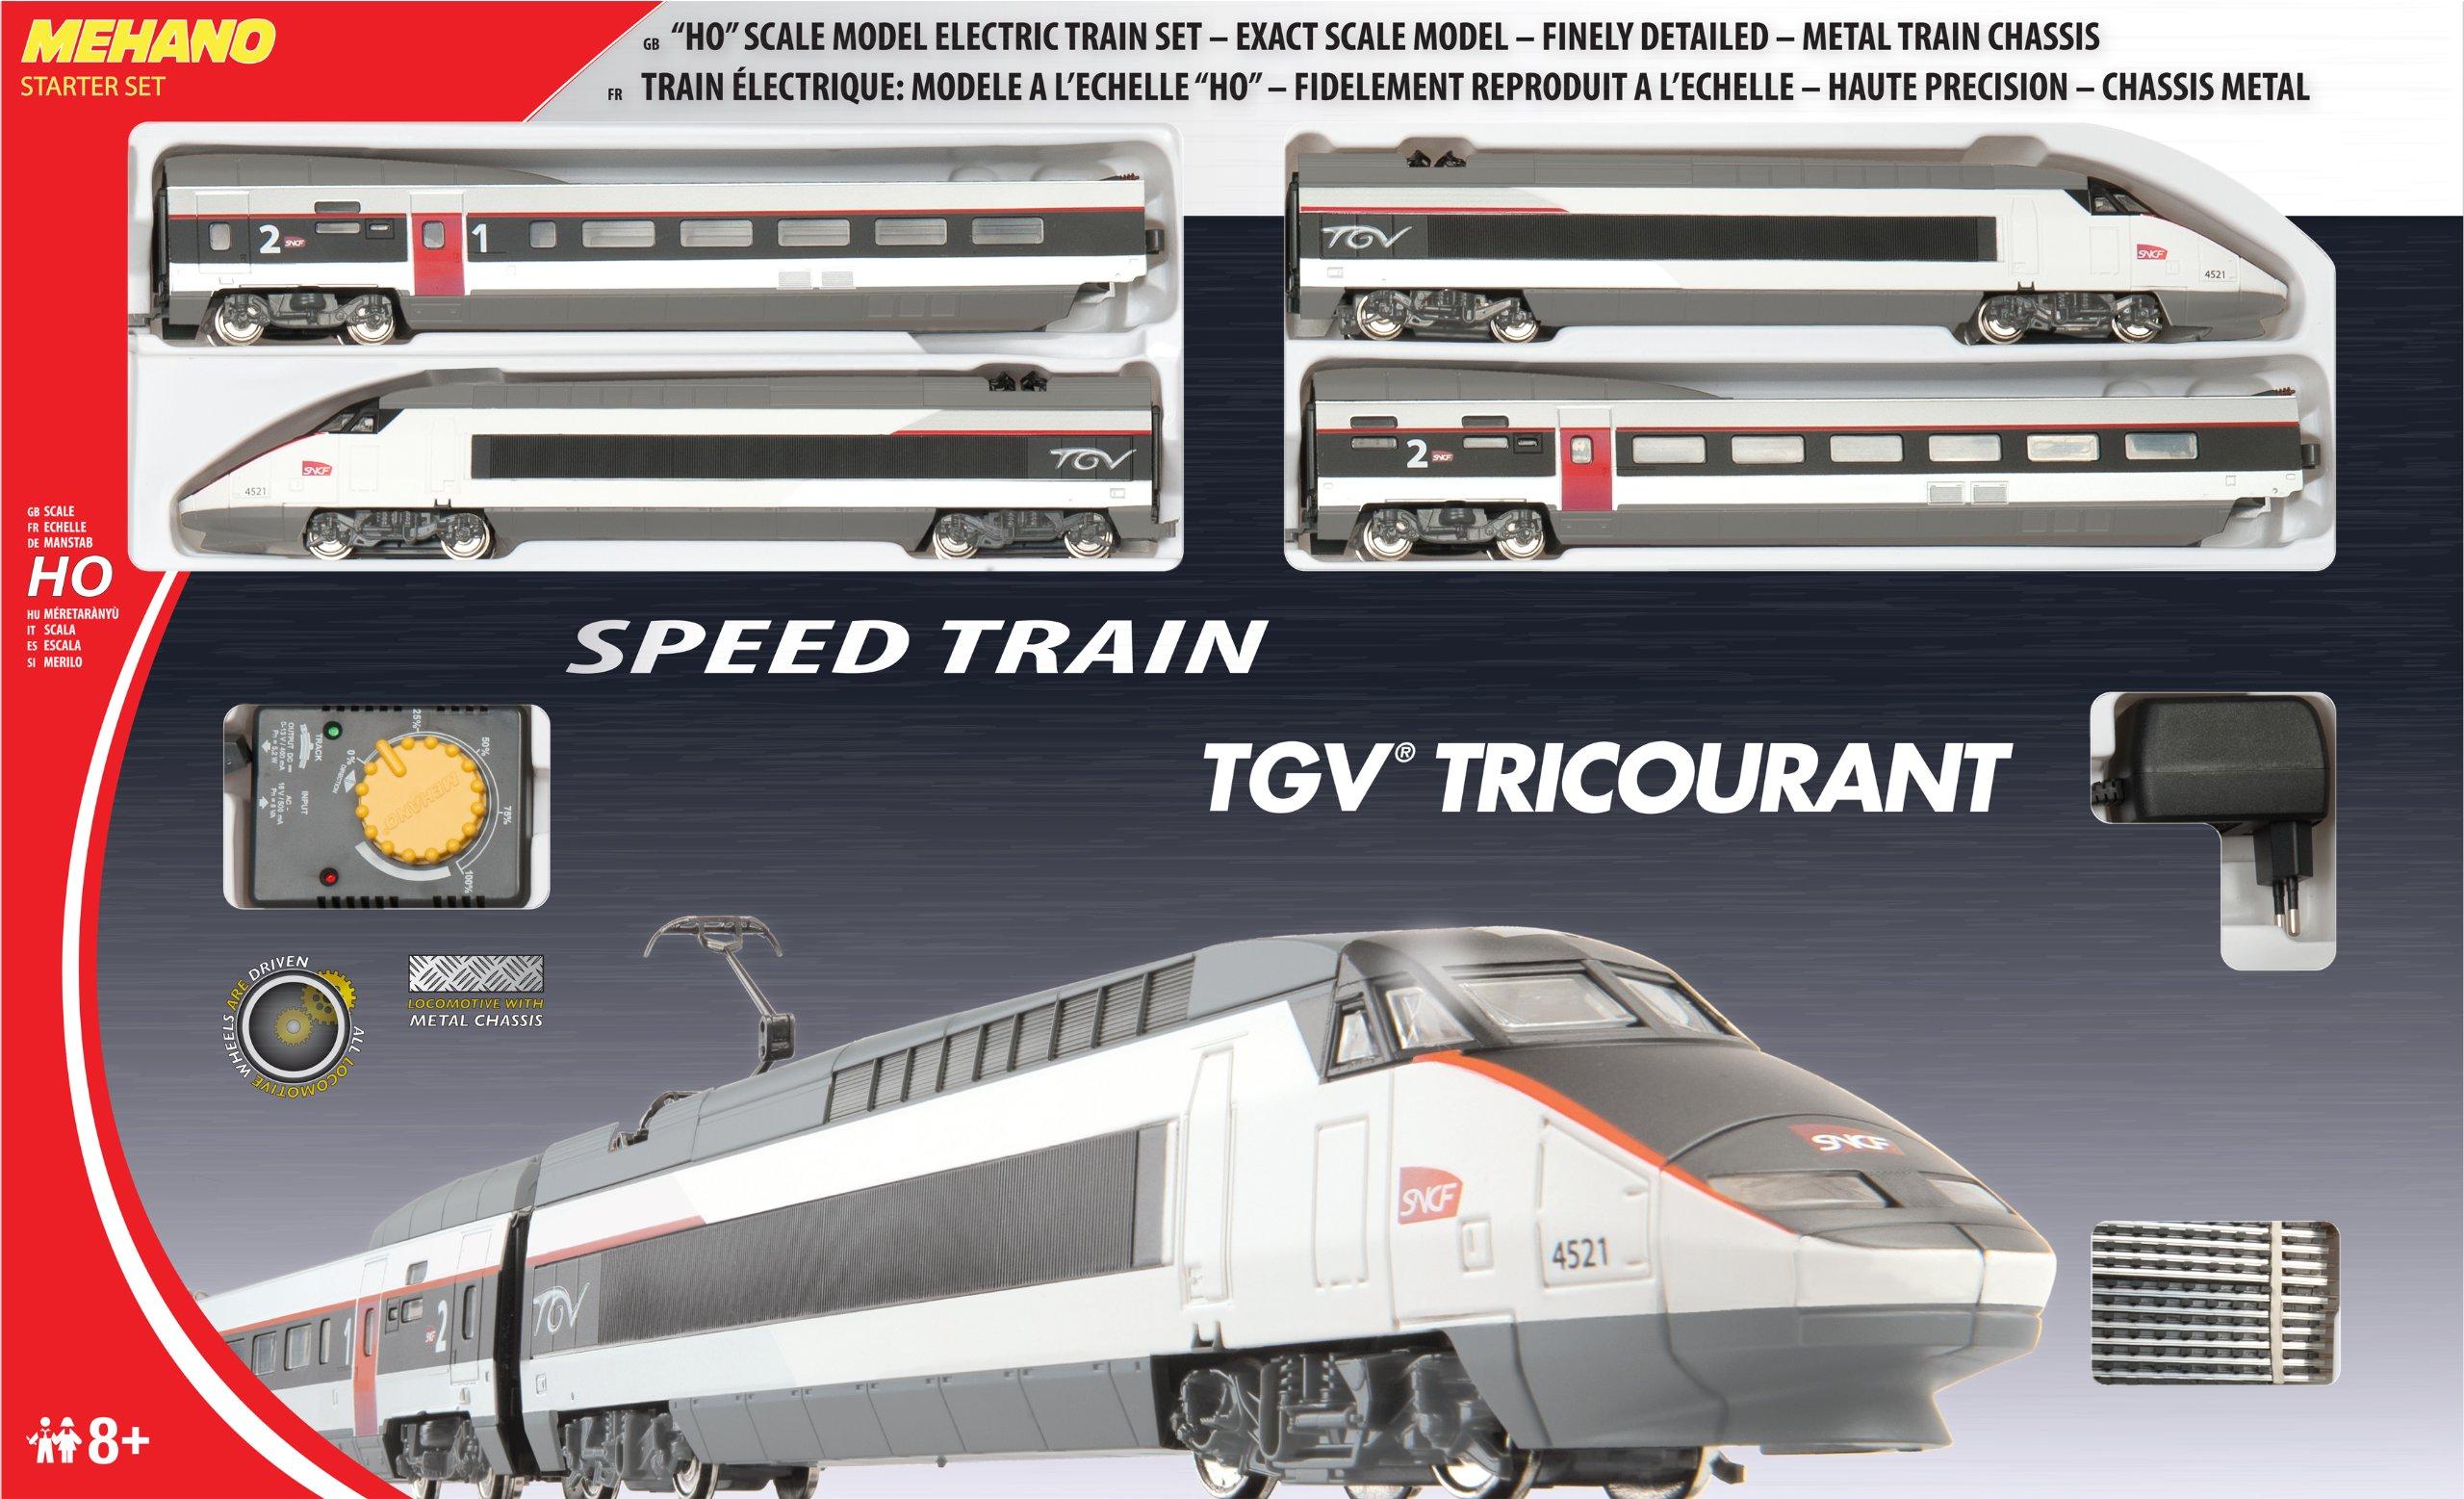 MEHANO TRAIN LINE - HO Scale Train Set - SPEEDTRAIN, TGV Tricourant SNCF